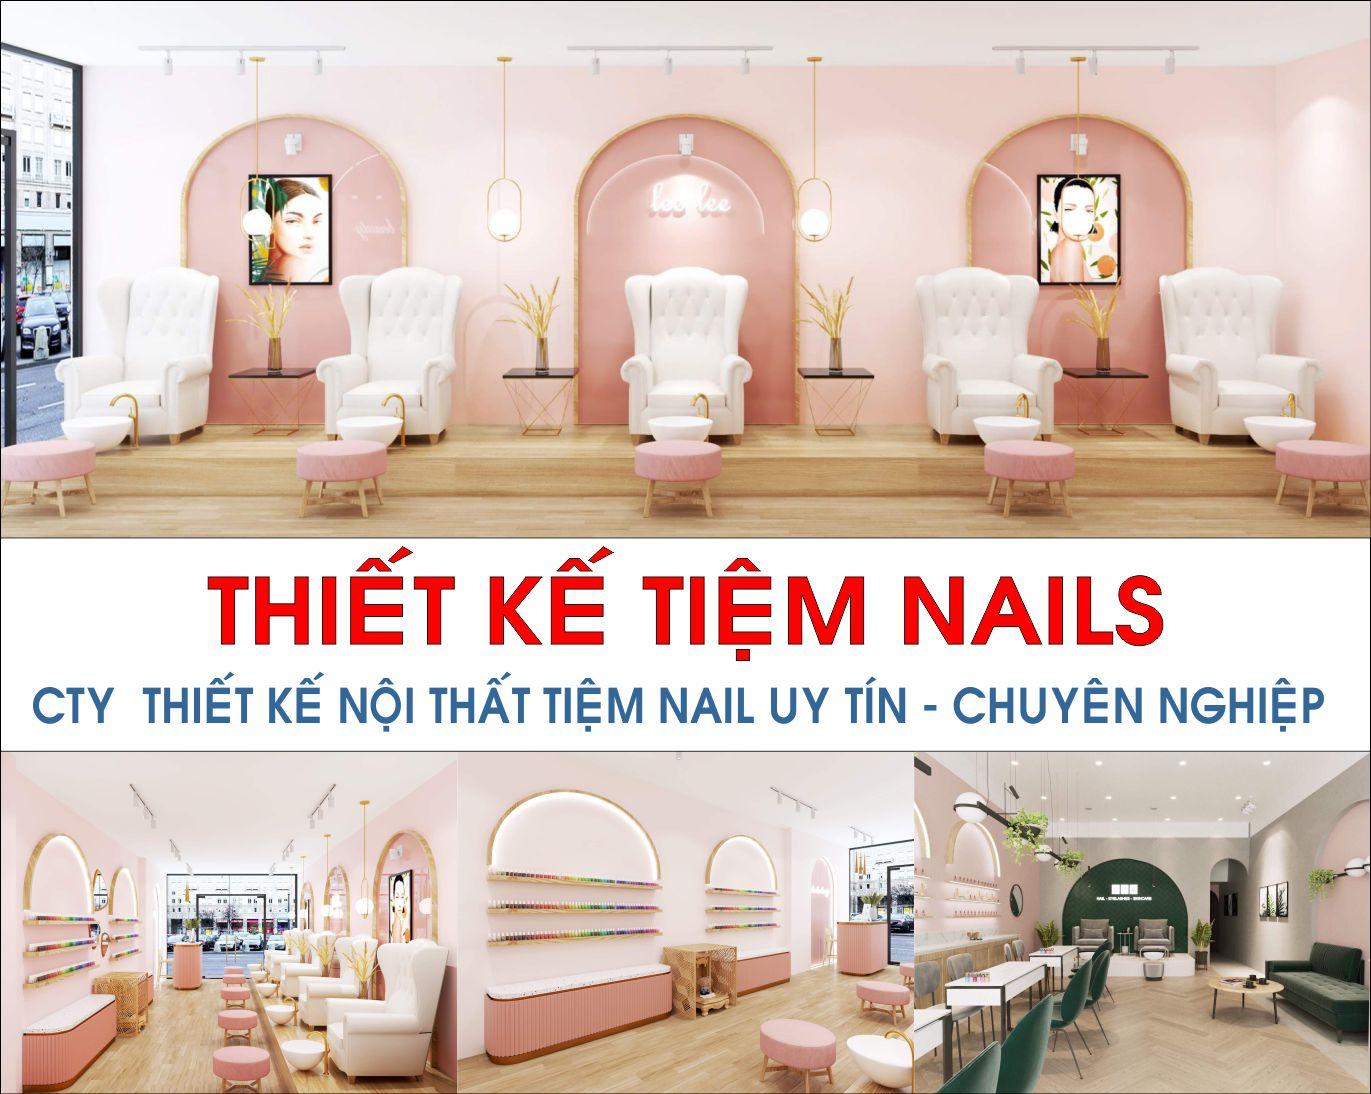 thiet-ke-tiem-nail-chuyen-nghiep